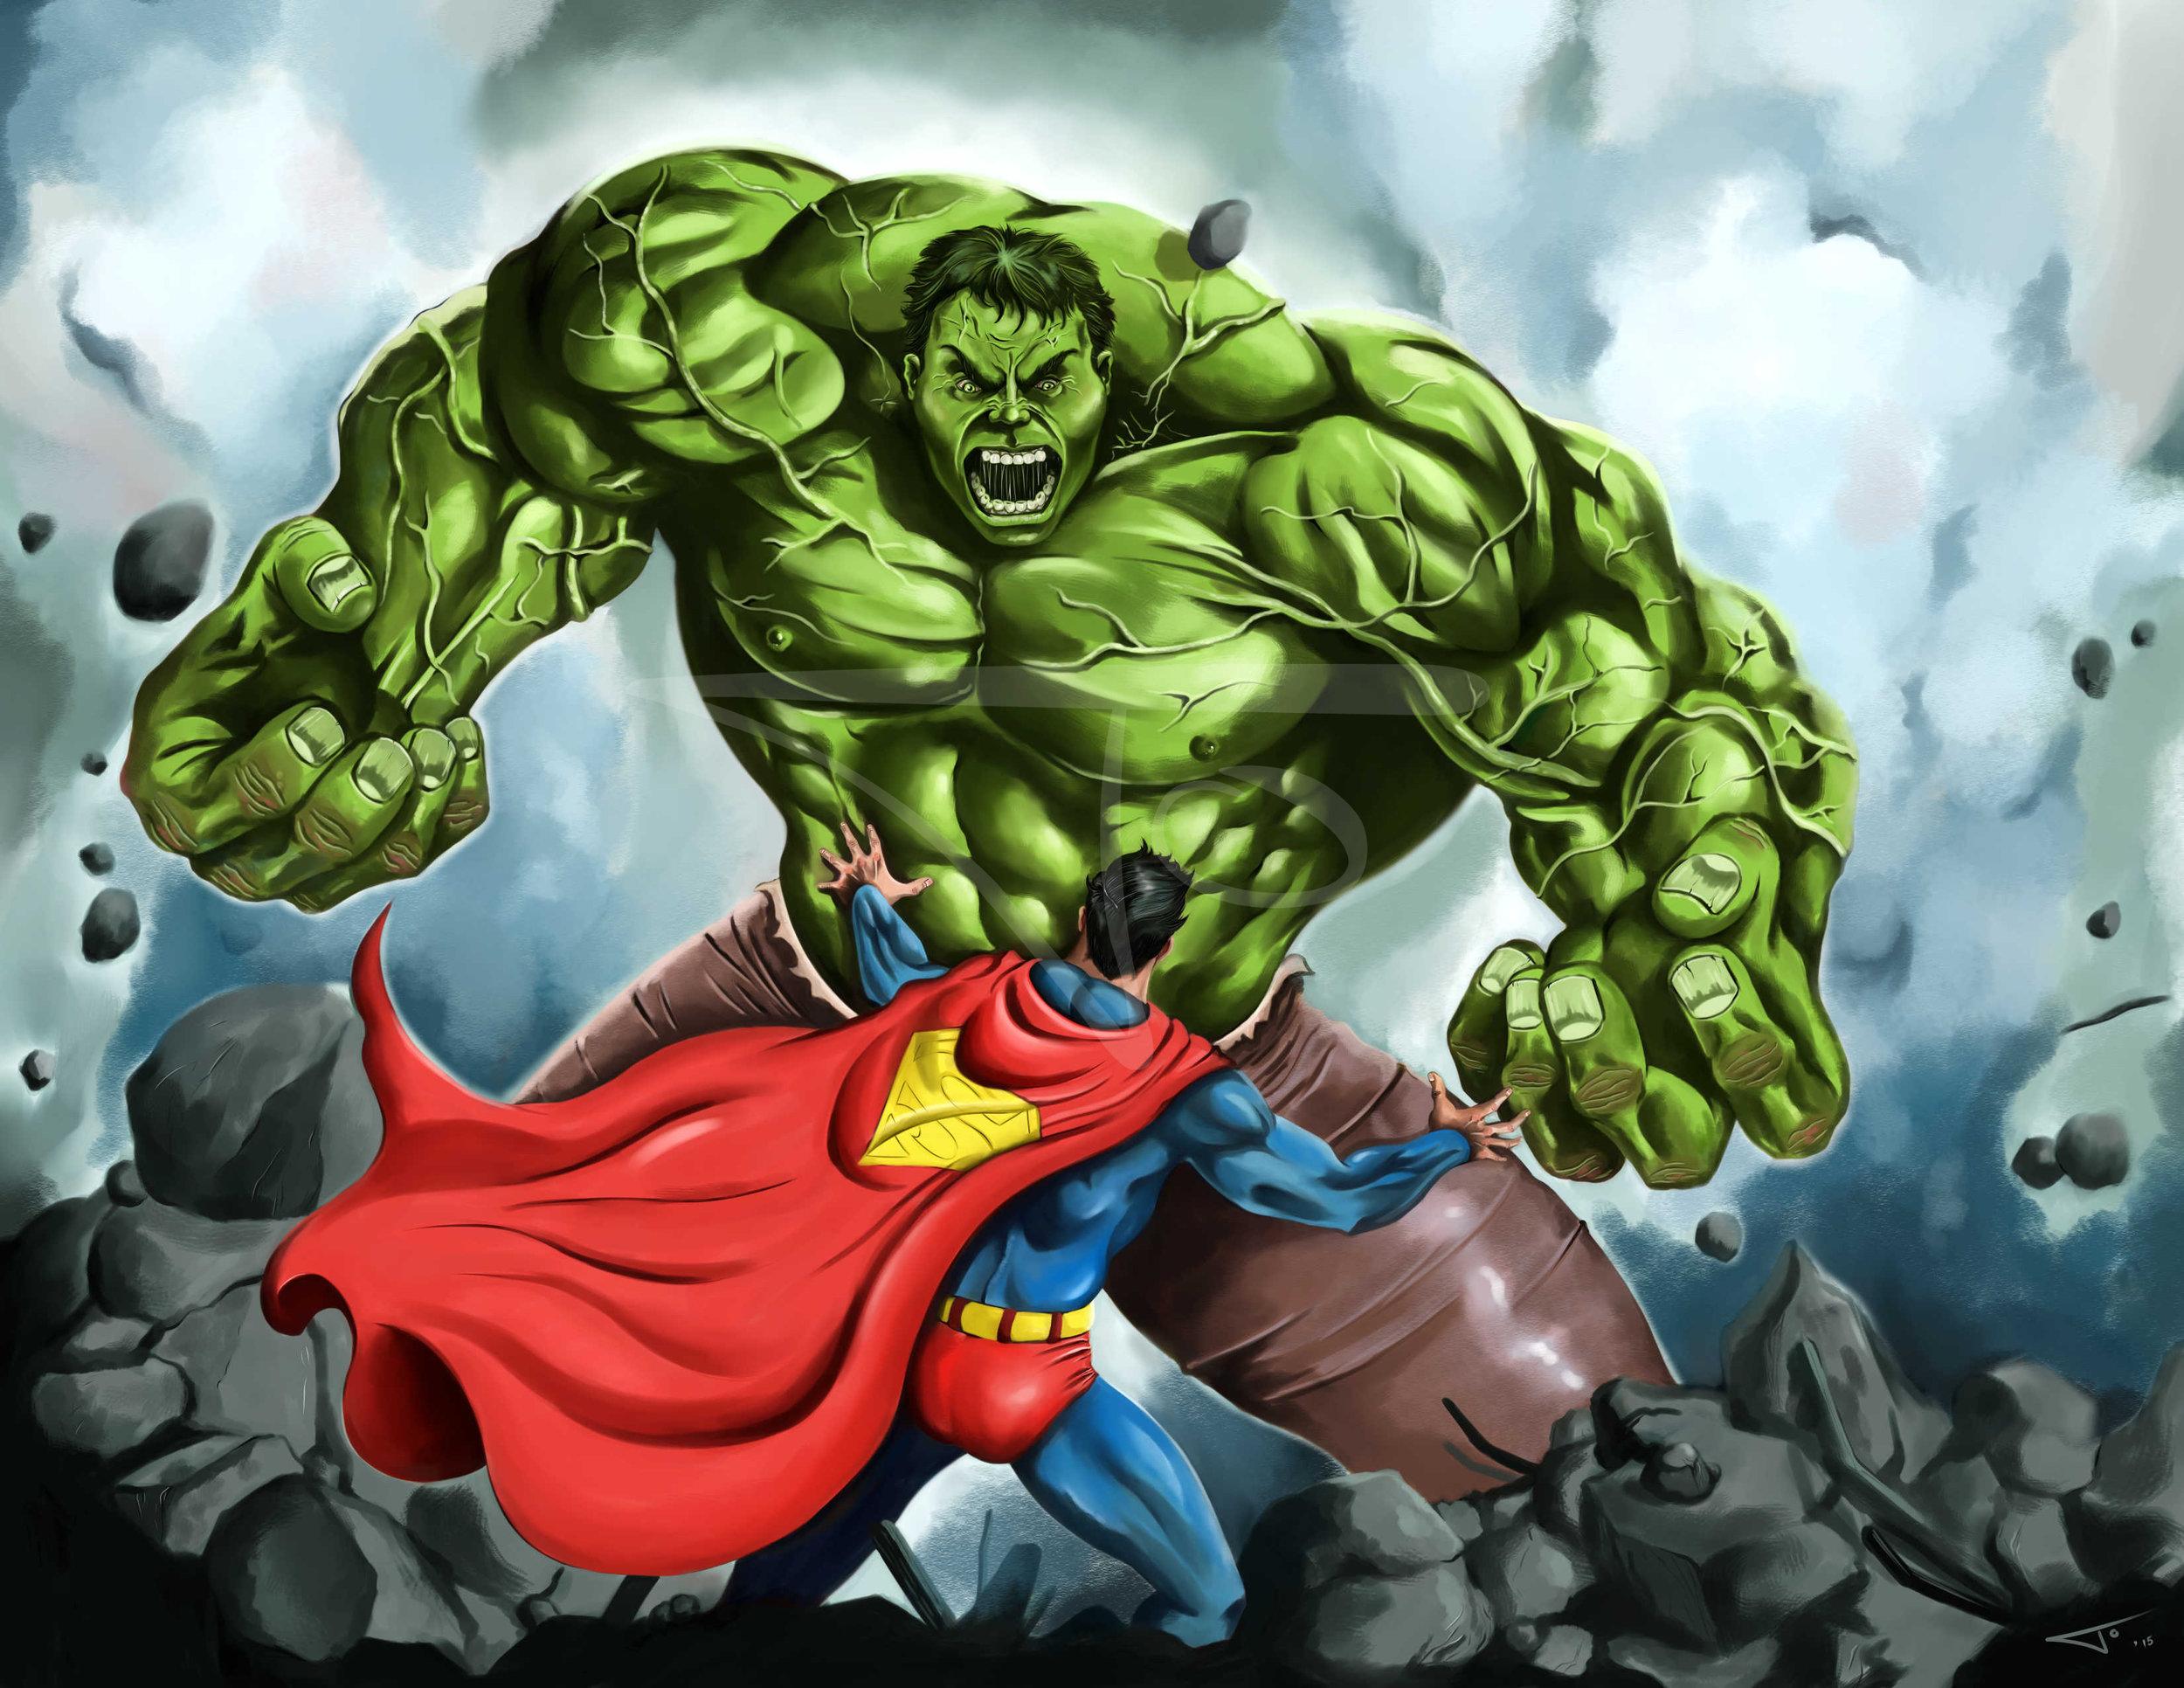 Hulk vs Superman Edited 2017 Watermark.jpg